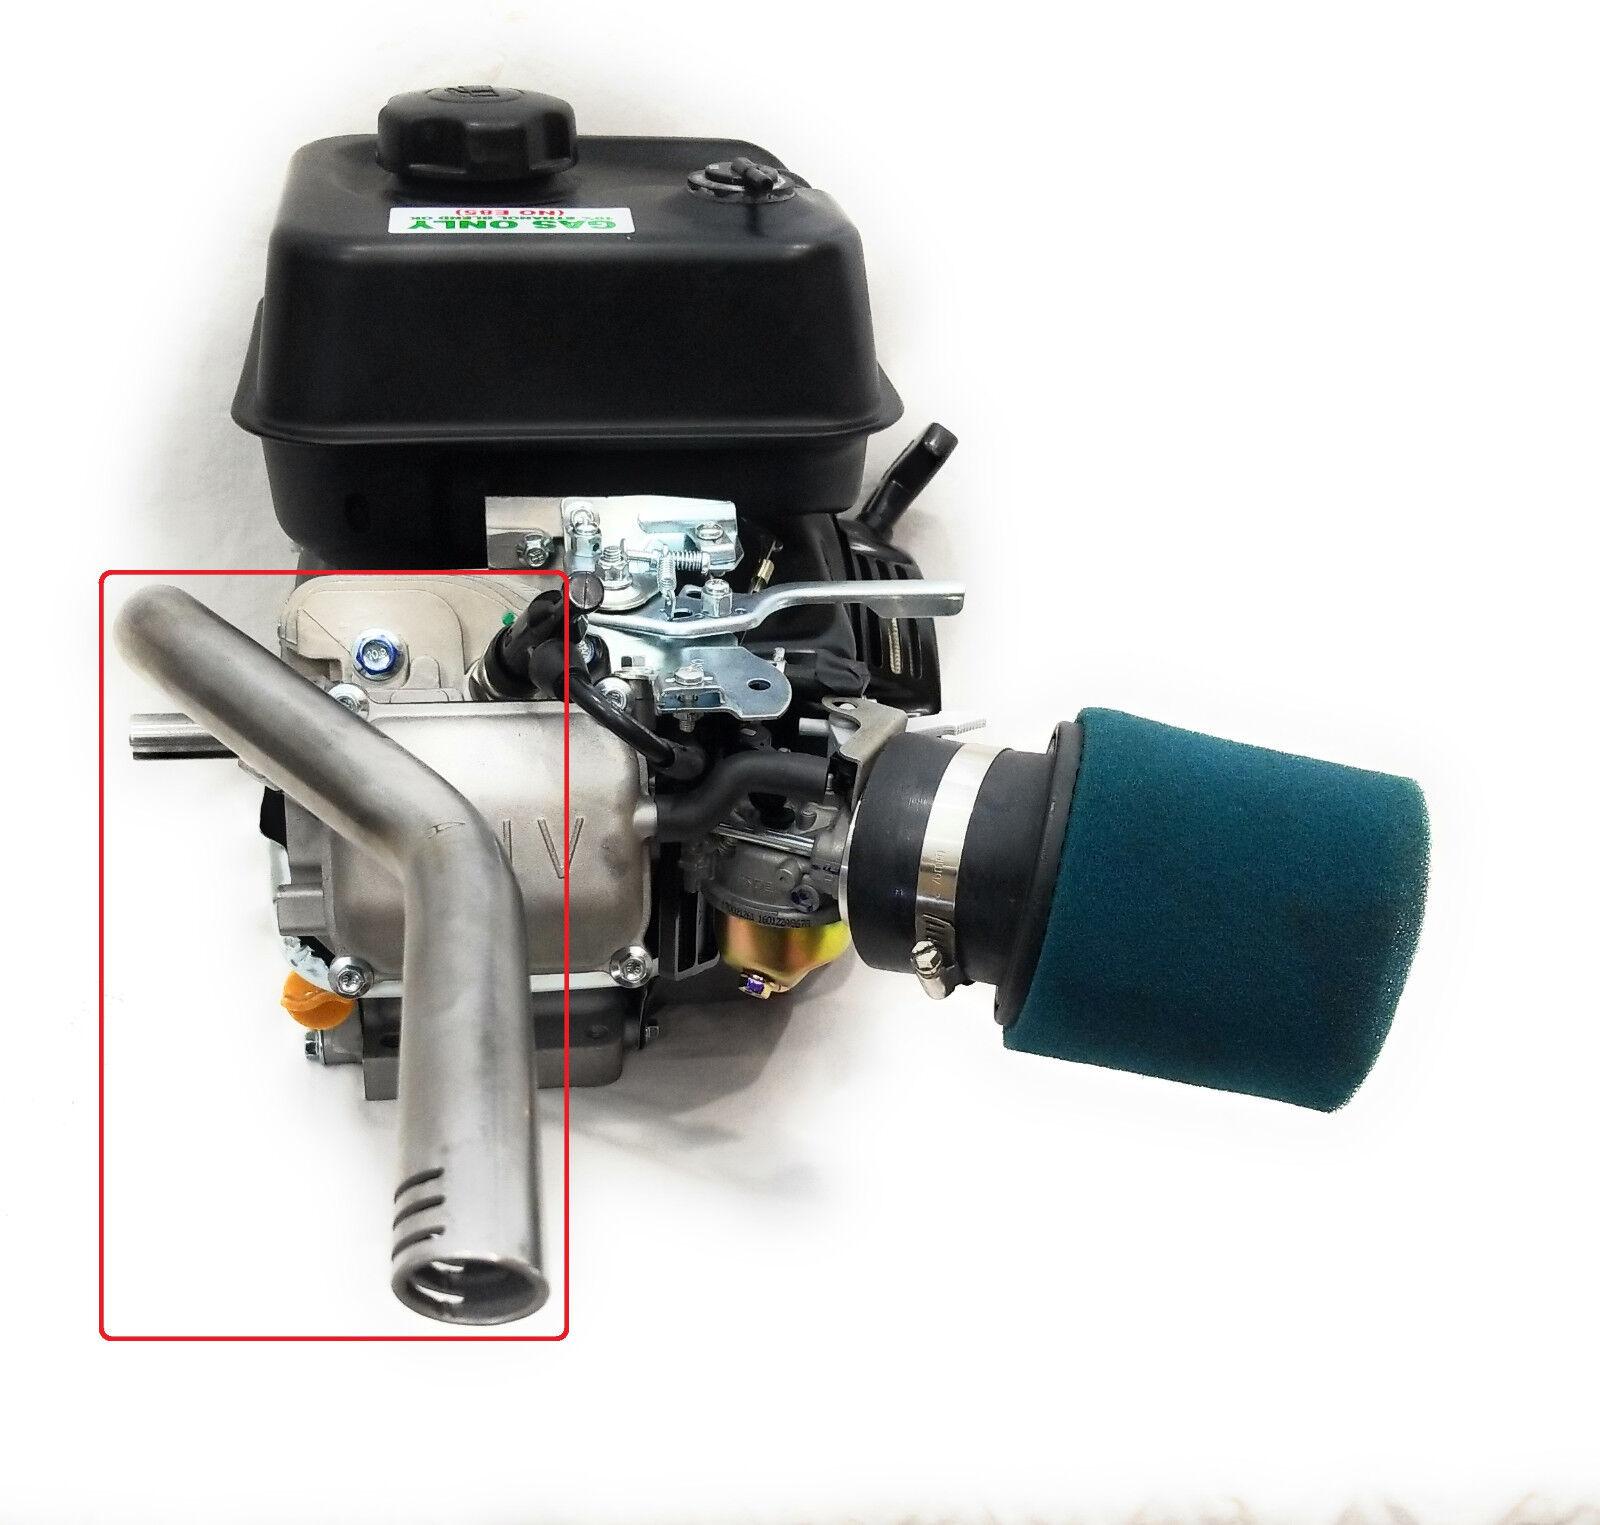 Center Rear Header Exhaust Pipe for Predator  212cc, GX160, GX200. Powerhorse 208  online sales